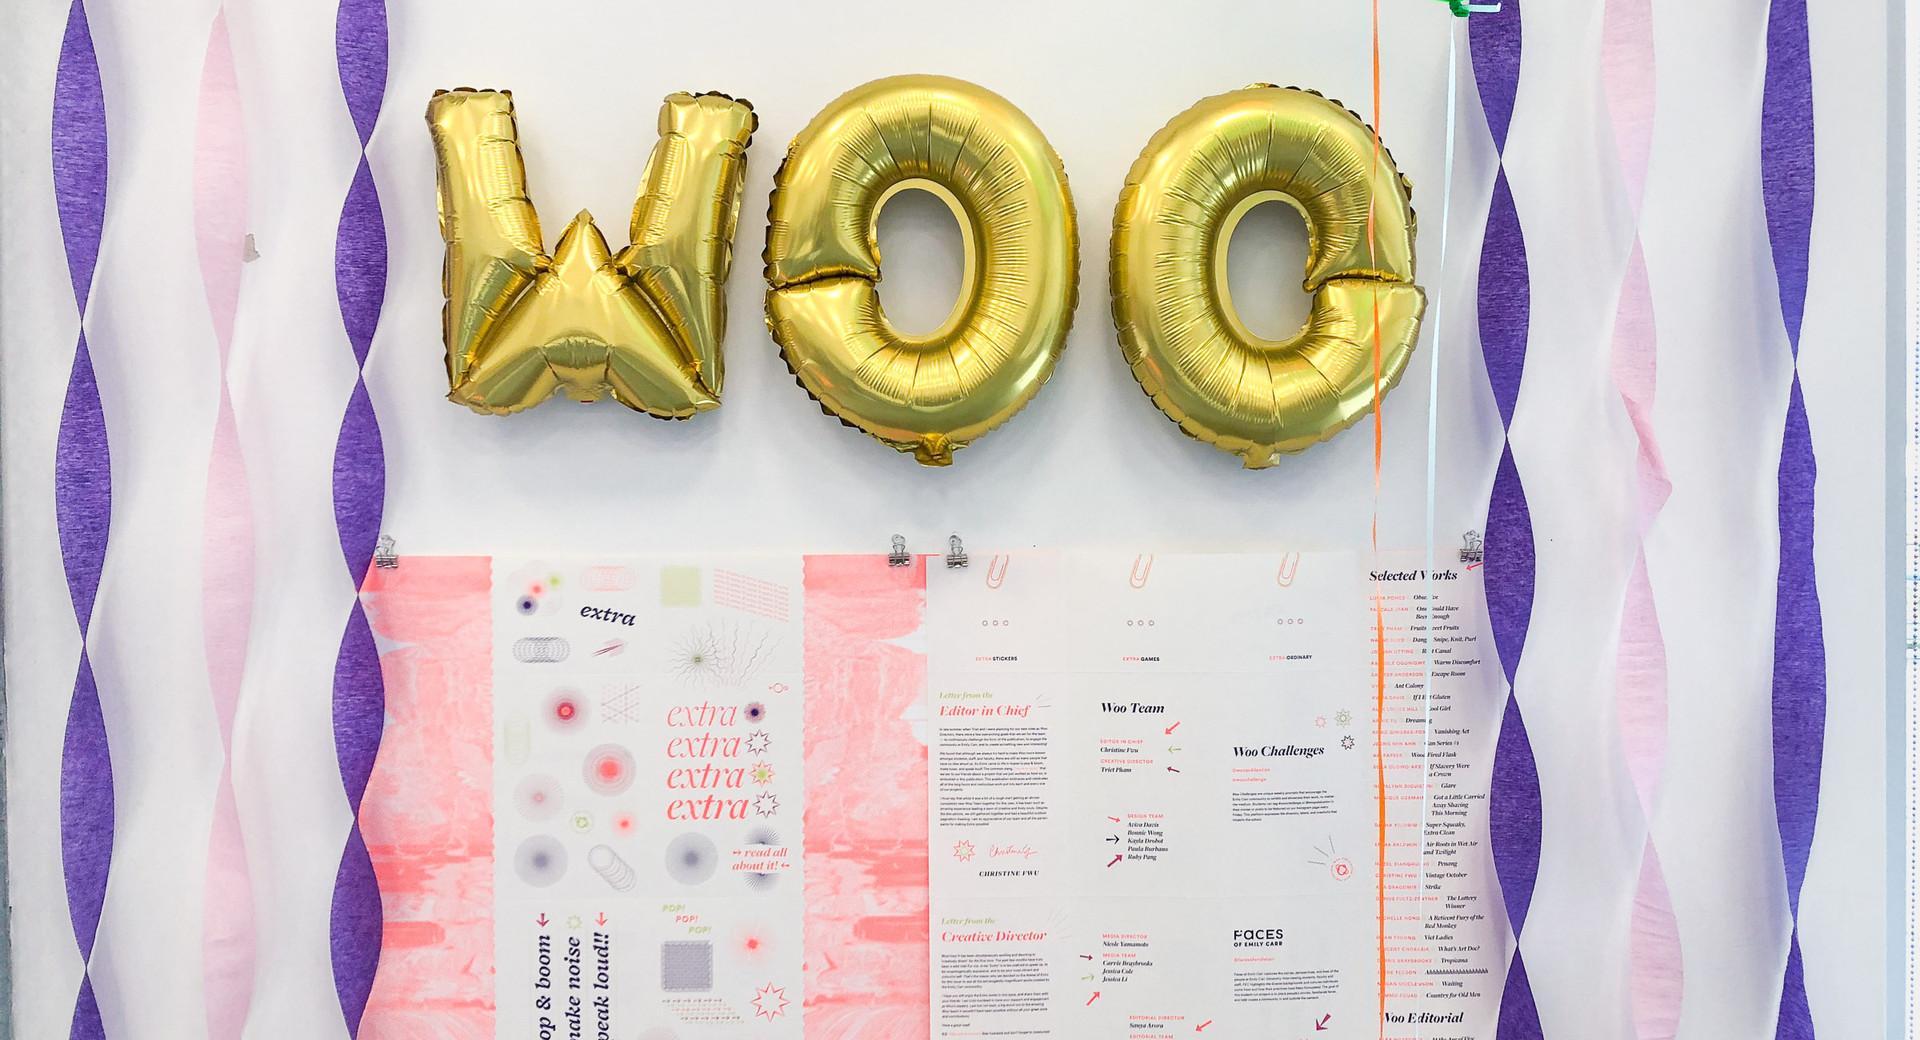 triet-pham-woo-extra-publication-launch-